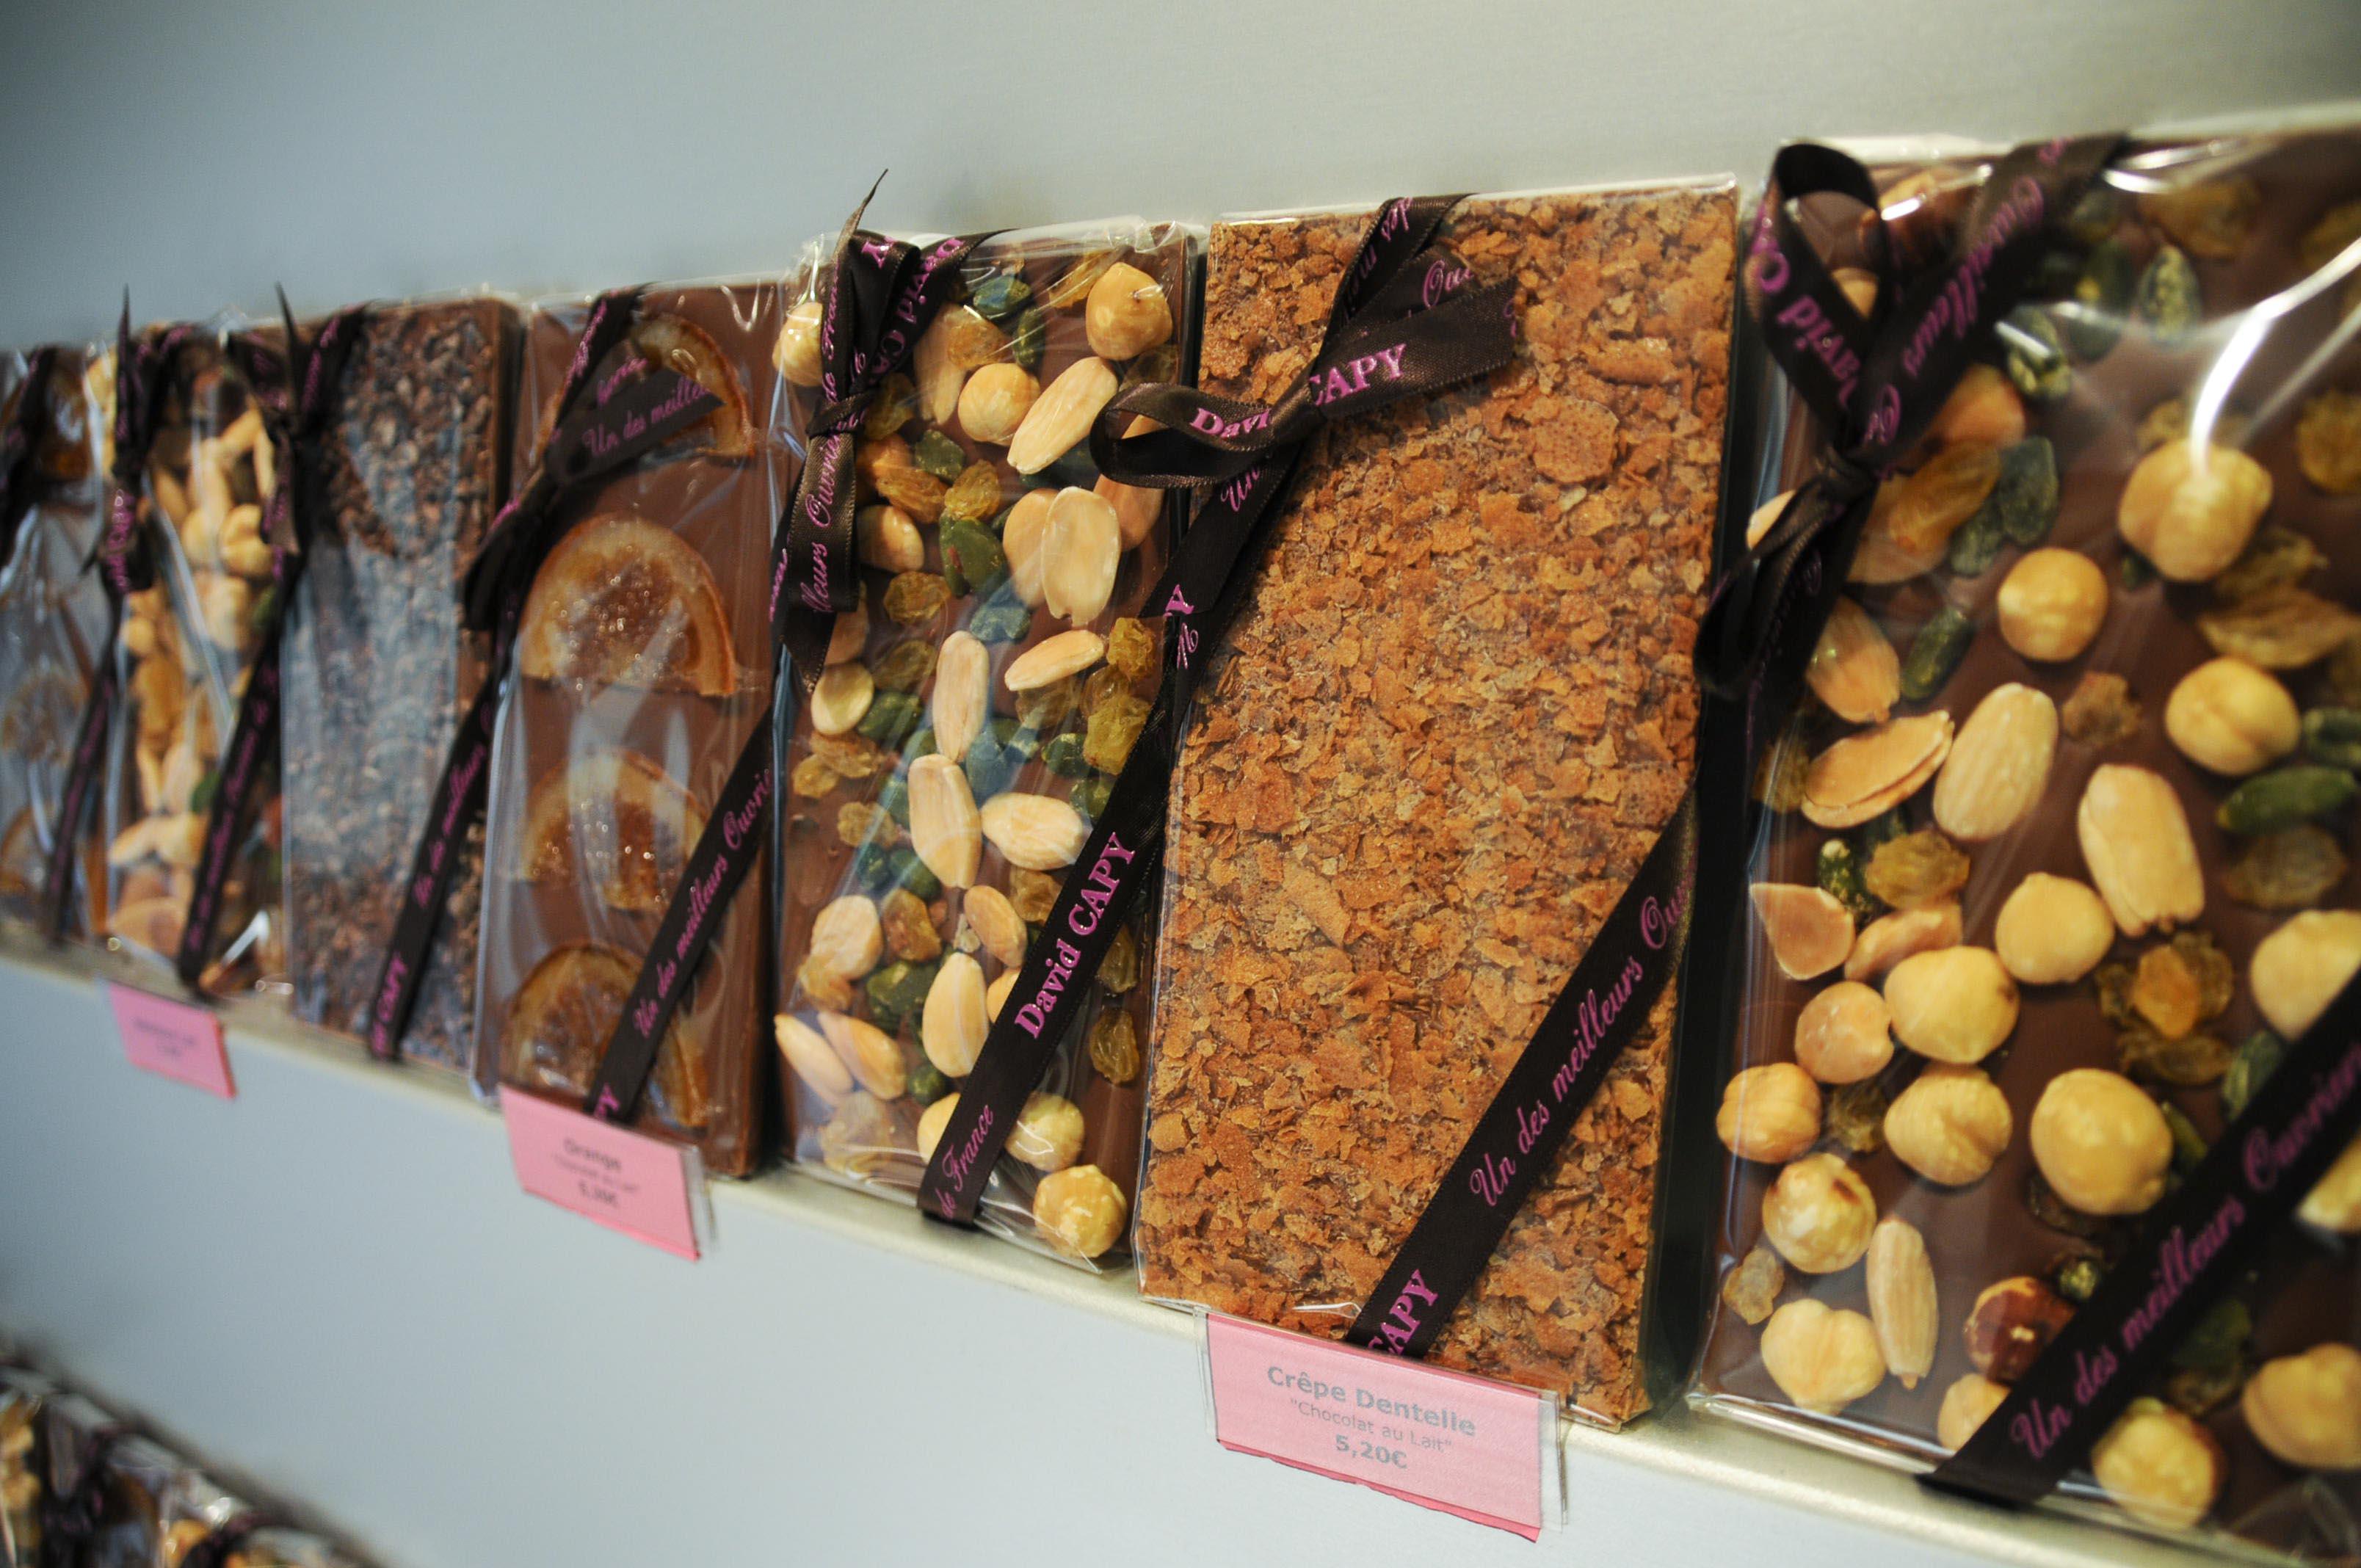 Chocolaterie de David Capy